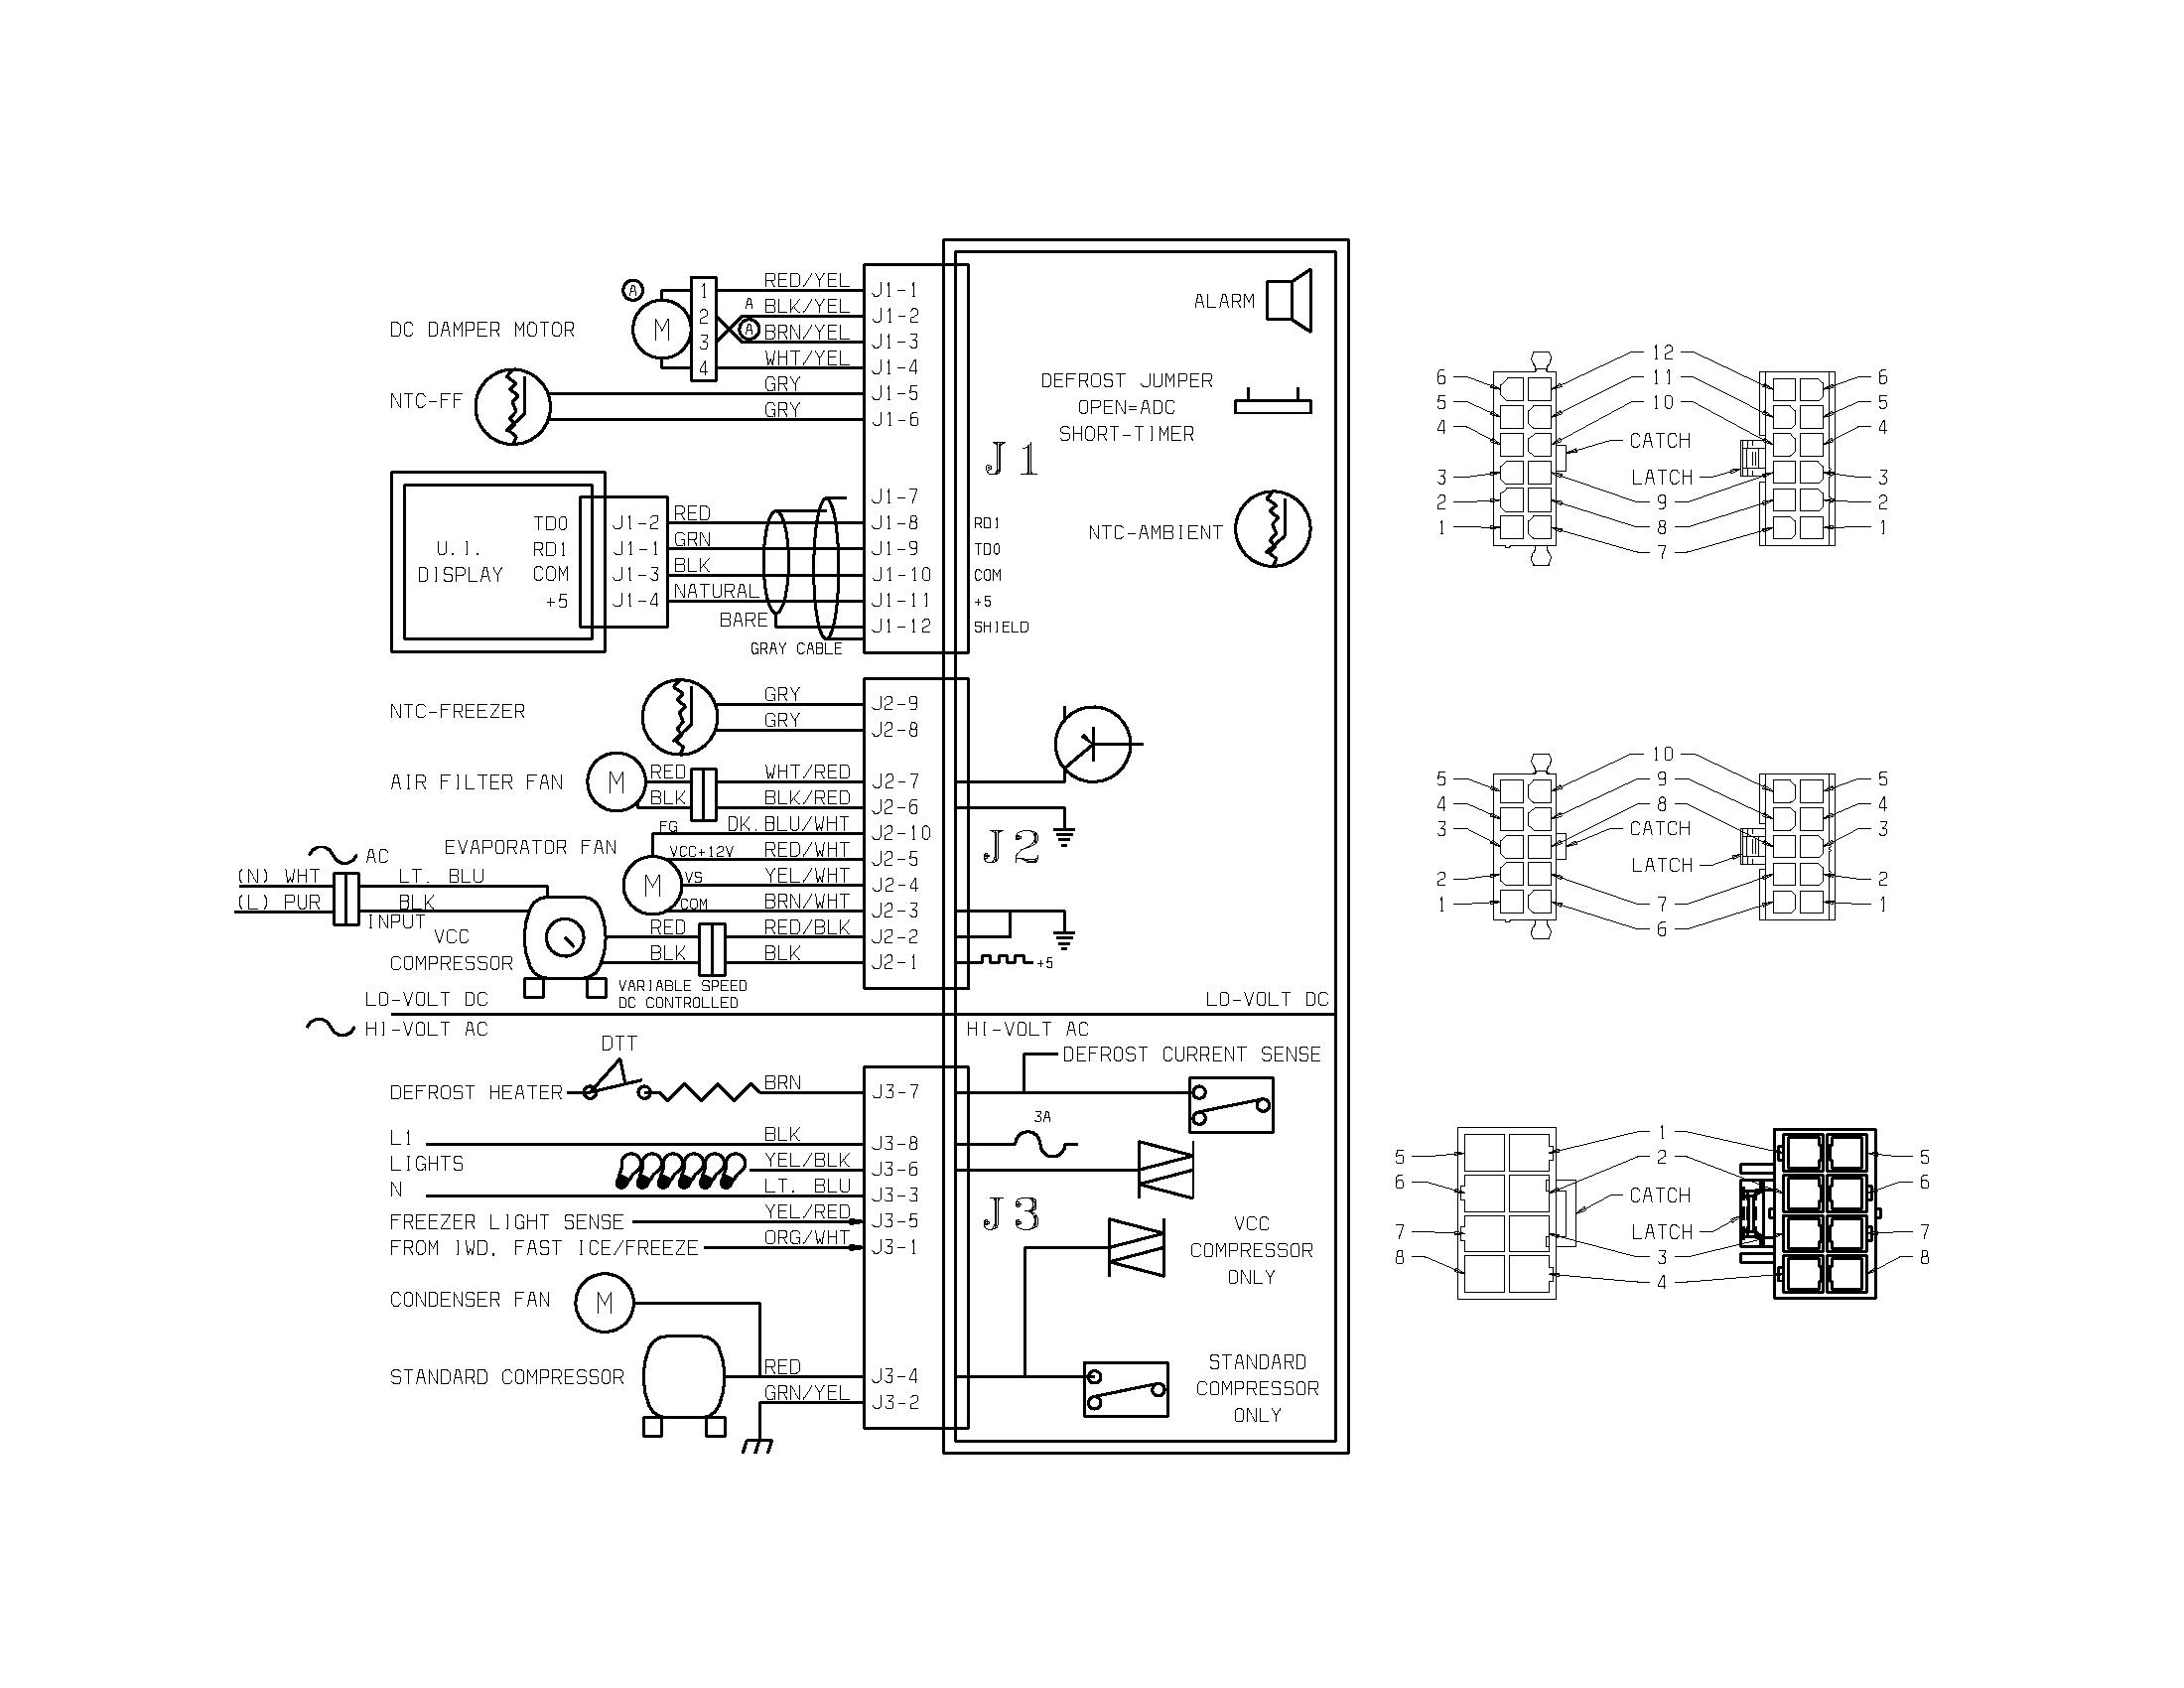 AA_7923] Refrigerator Wiring Diagram Further Kenmore Elite Refrigerator  Wiring Wiring DiagramHemt Rally Hapolo Stre Tobiq Emba Mohammedshrine Librar Wiring 101